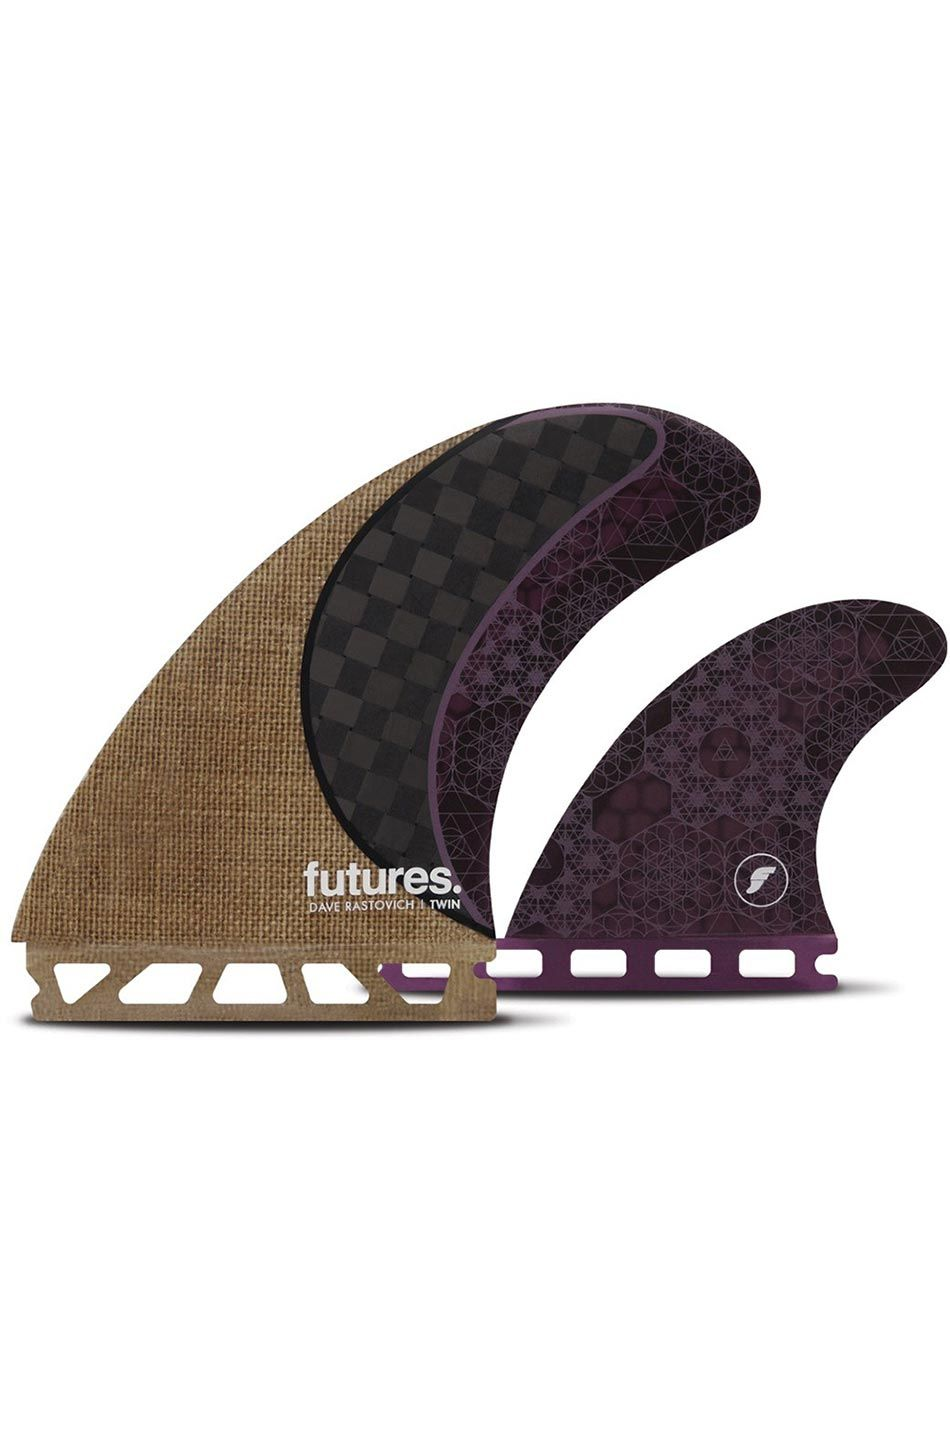 Quilha Future Fins RASTA TWIN JUTE/CARBON/PURPLE Twin/Bonzer